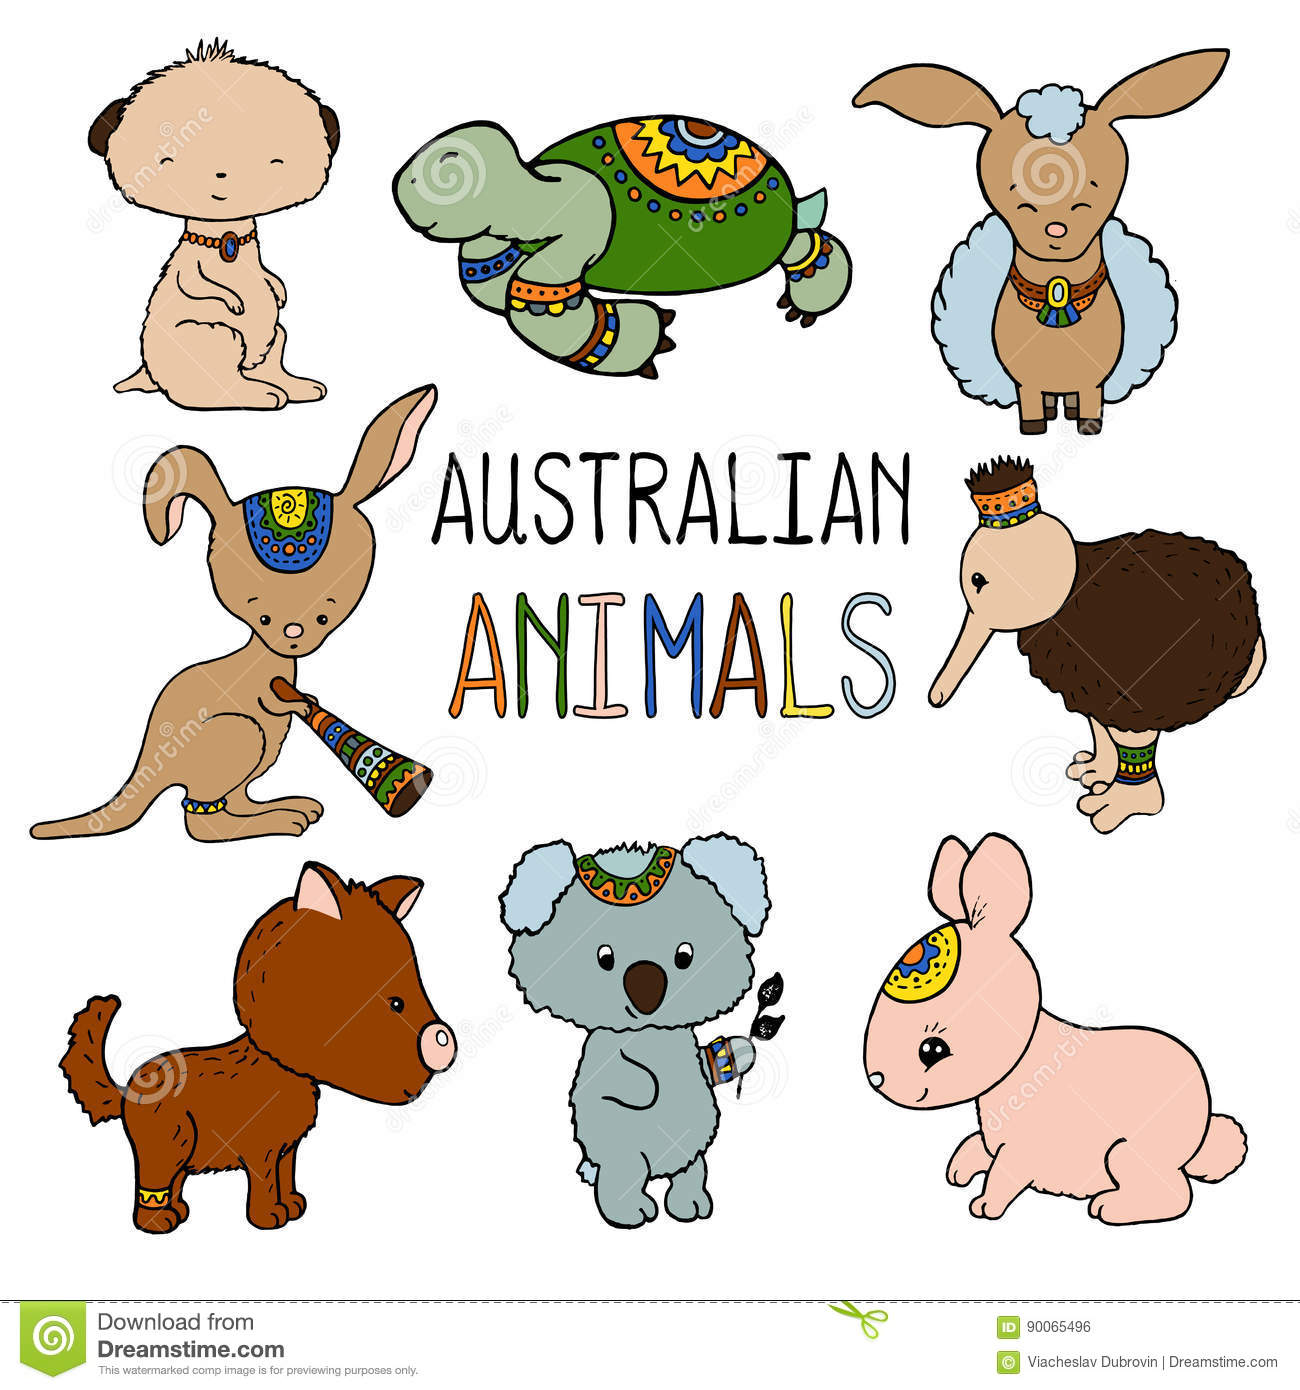 Australian Animals Colorful Illustration On White Background. Stock.